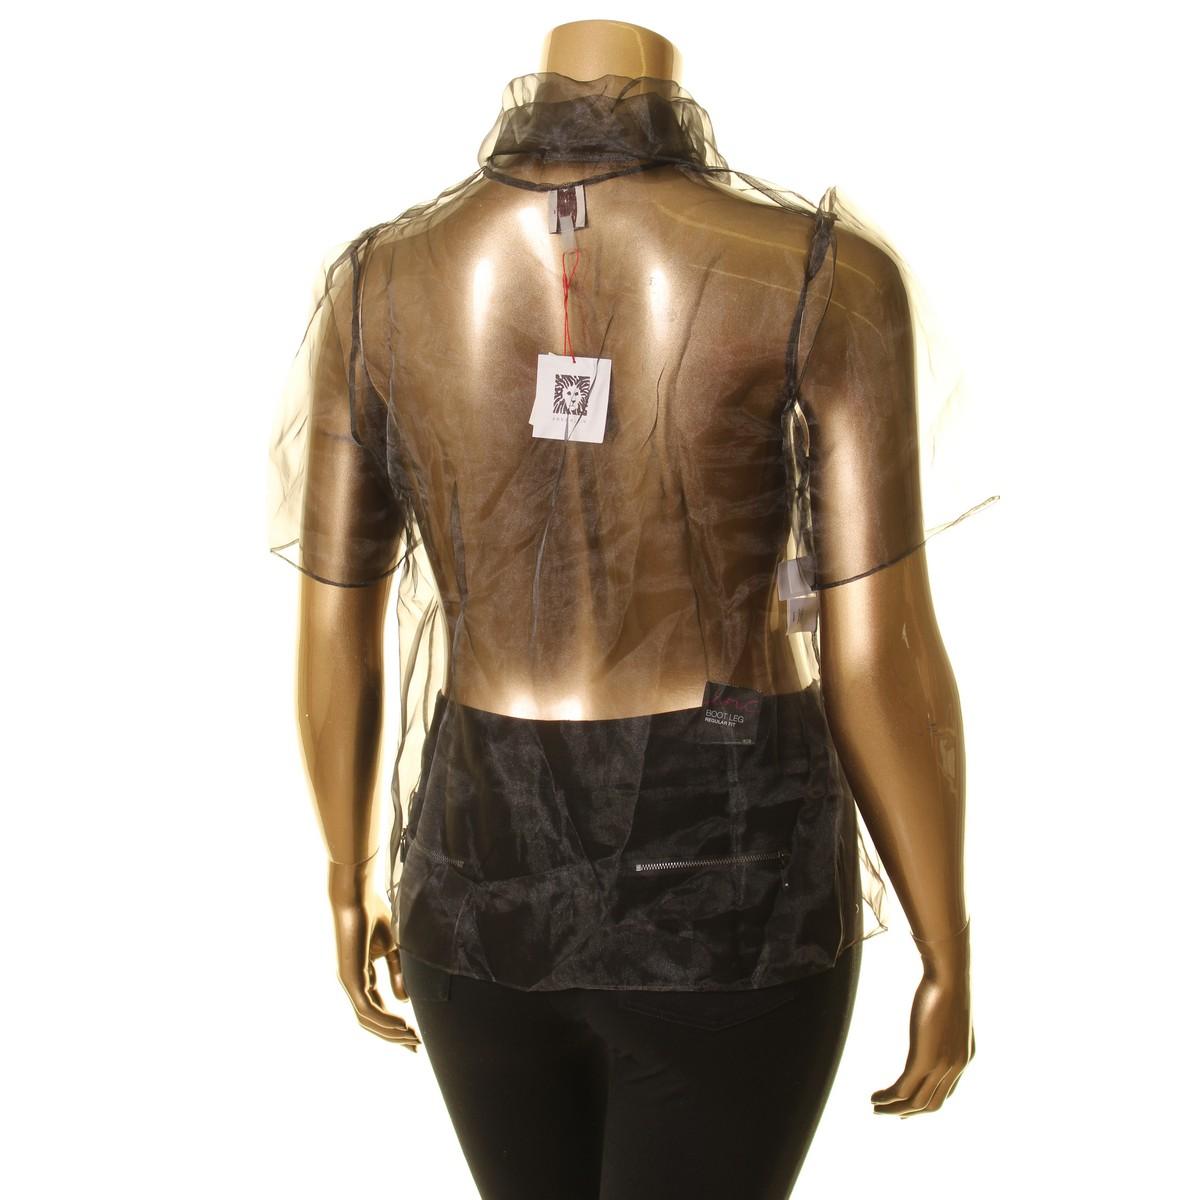 ANNE-KLEIN-NEW-Women-039-s-Short-Sleeve-Sheer-Tie-Neck-Blouse-Shirt-Top-TEDO thumbnail 4